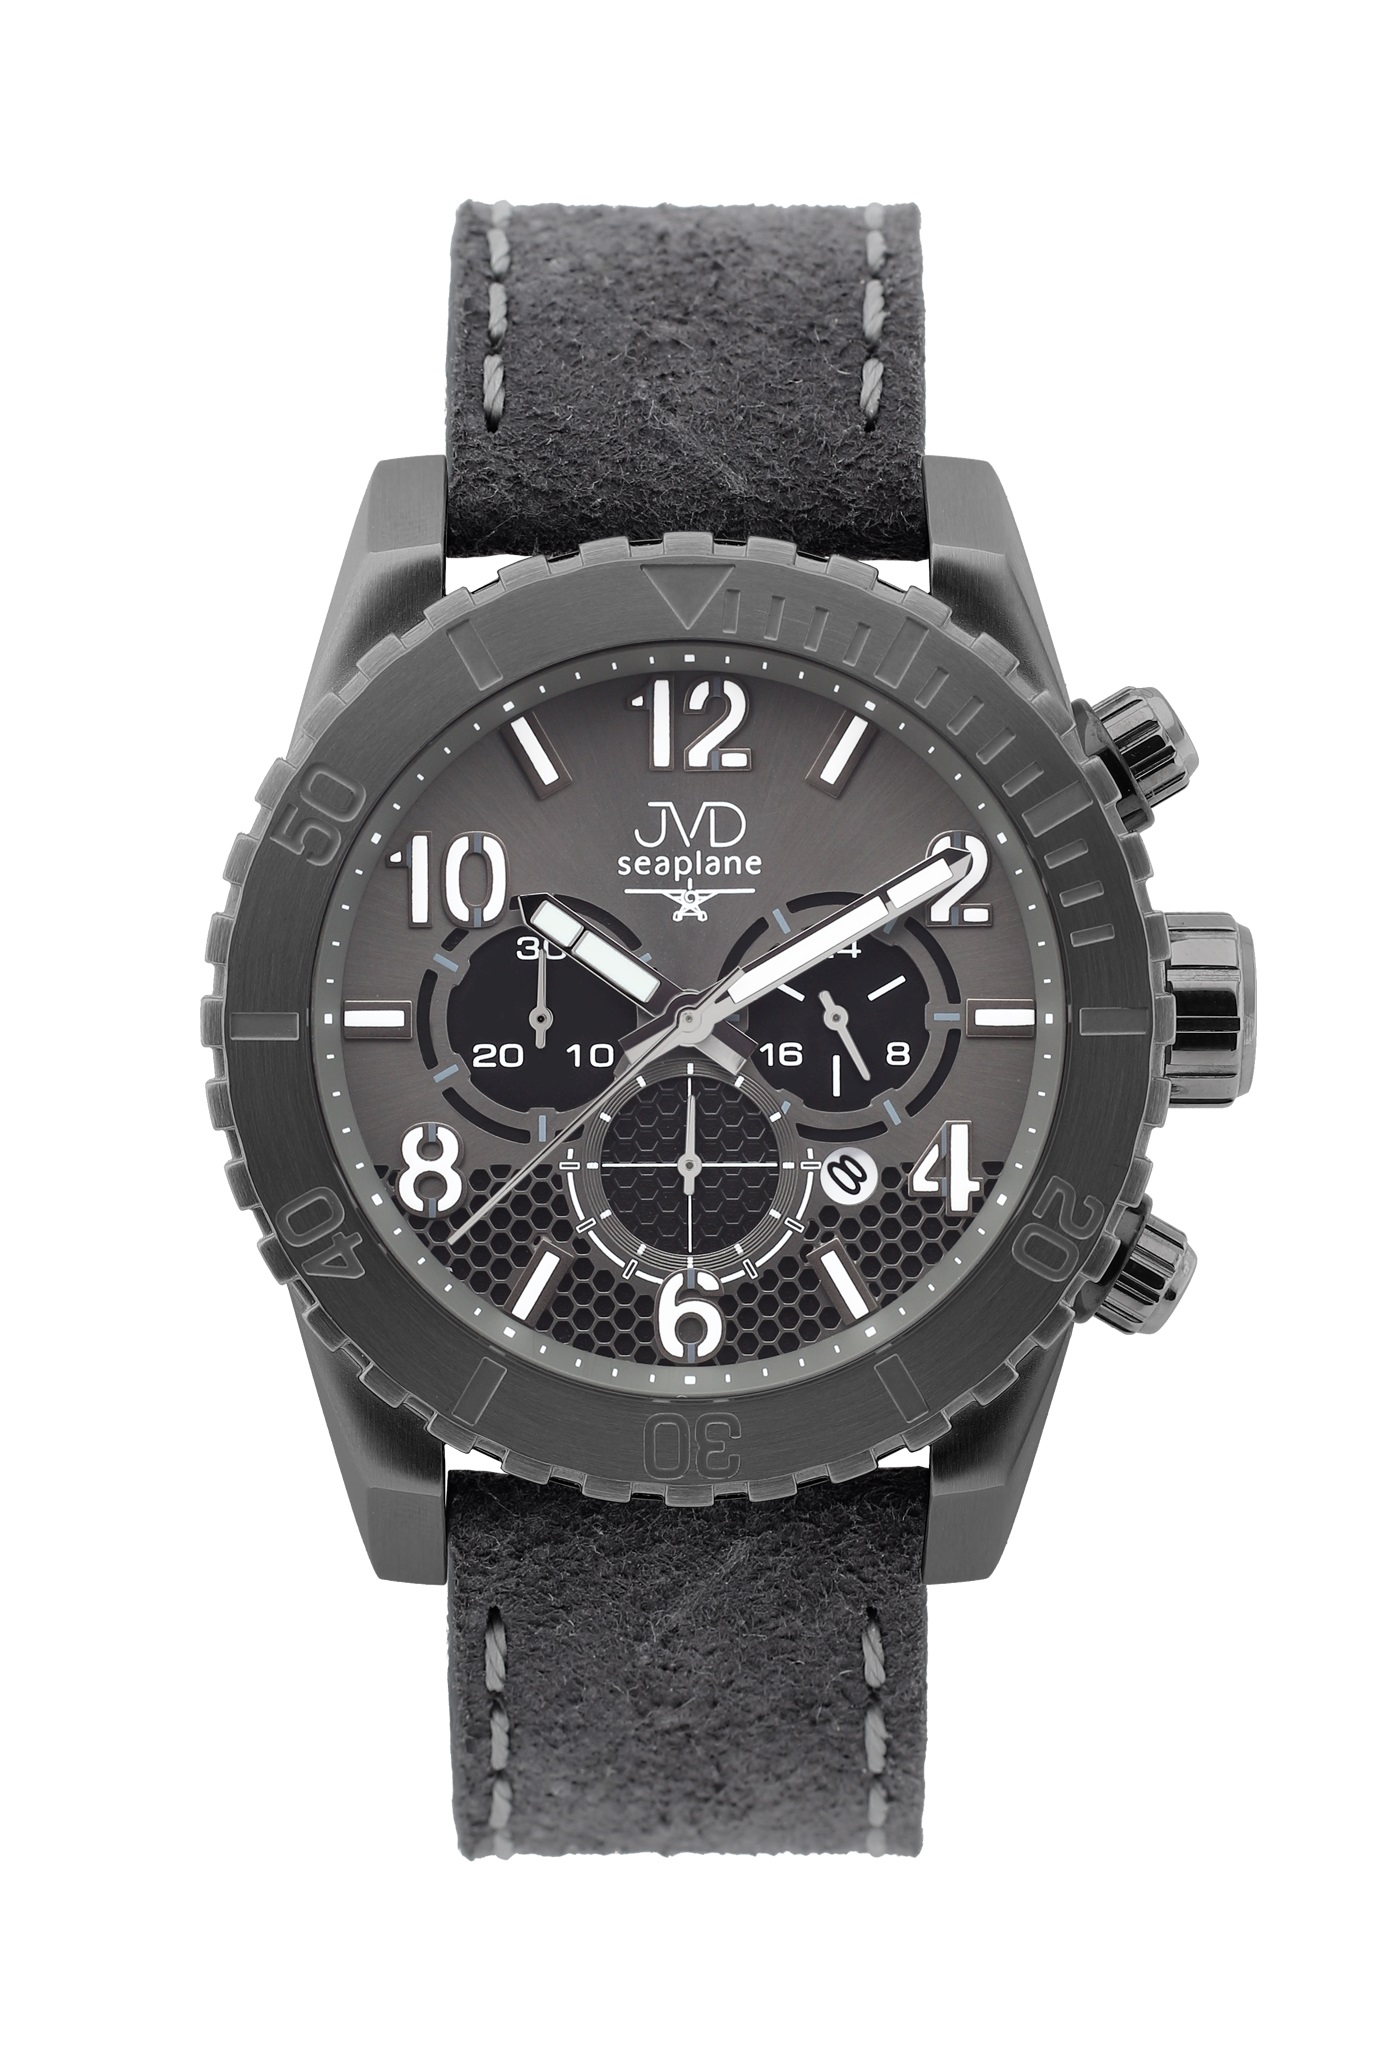 Vodotěsné pánské náramkové hodinky Seaplane METEOR JC703.3 (POŠTOVNÉ ZDARMA!!!)